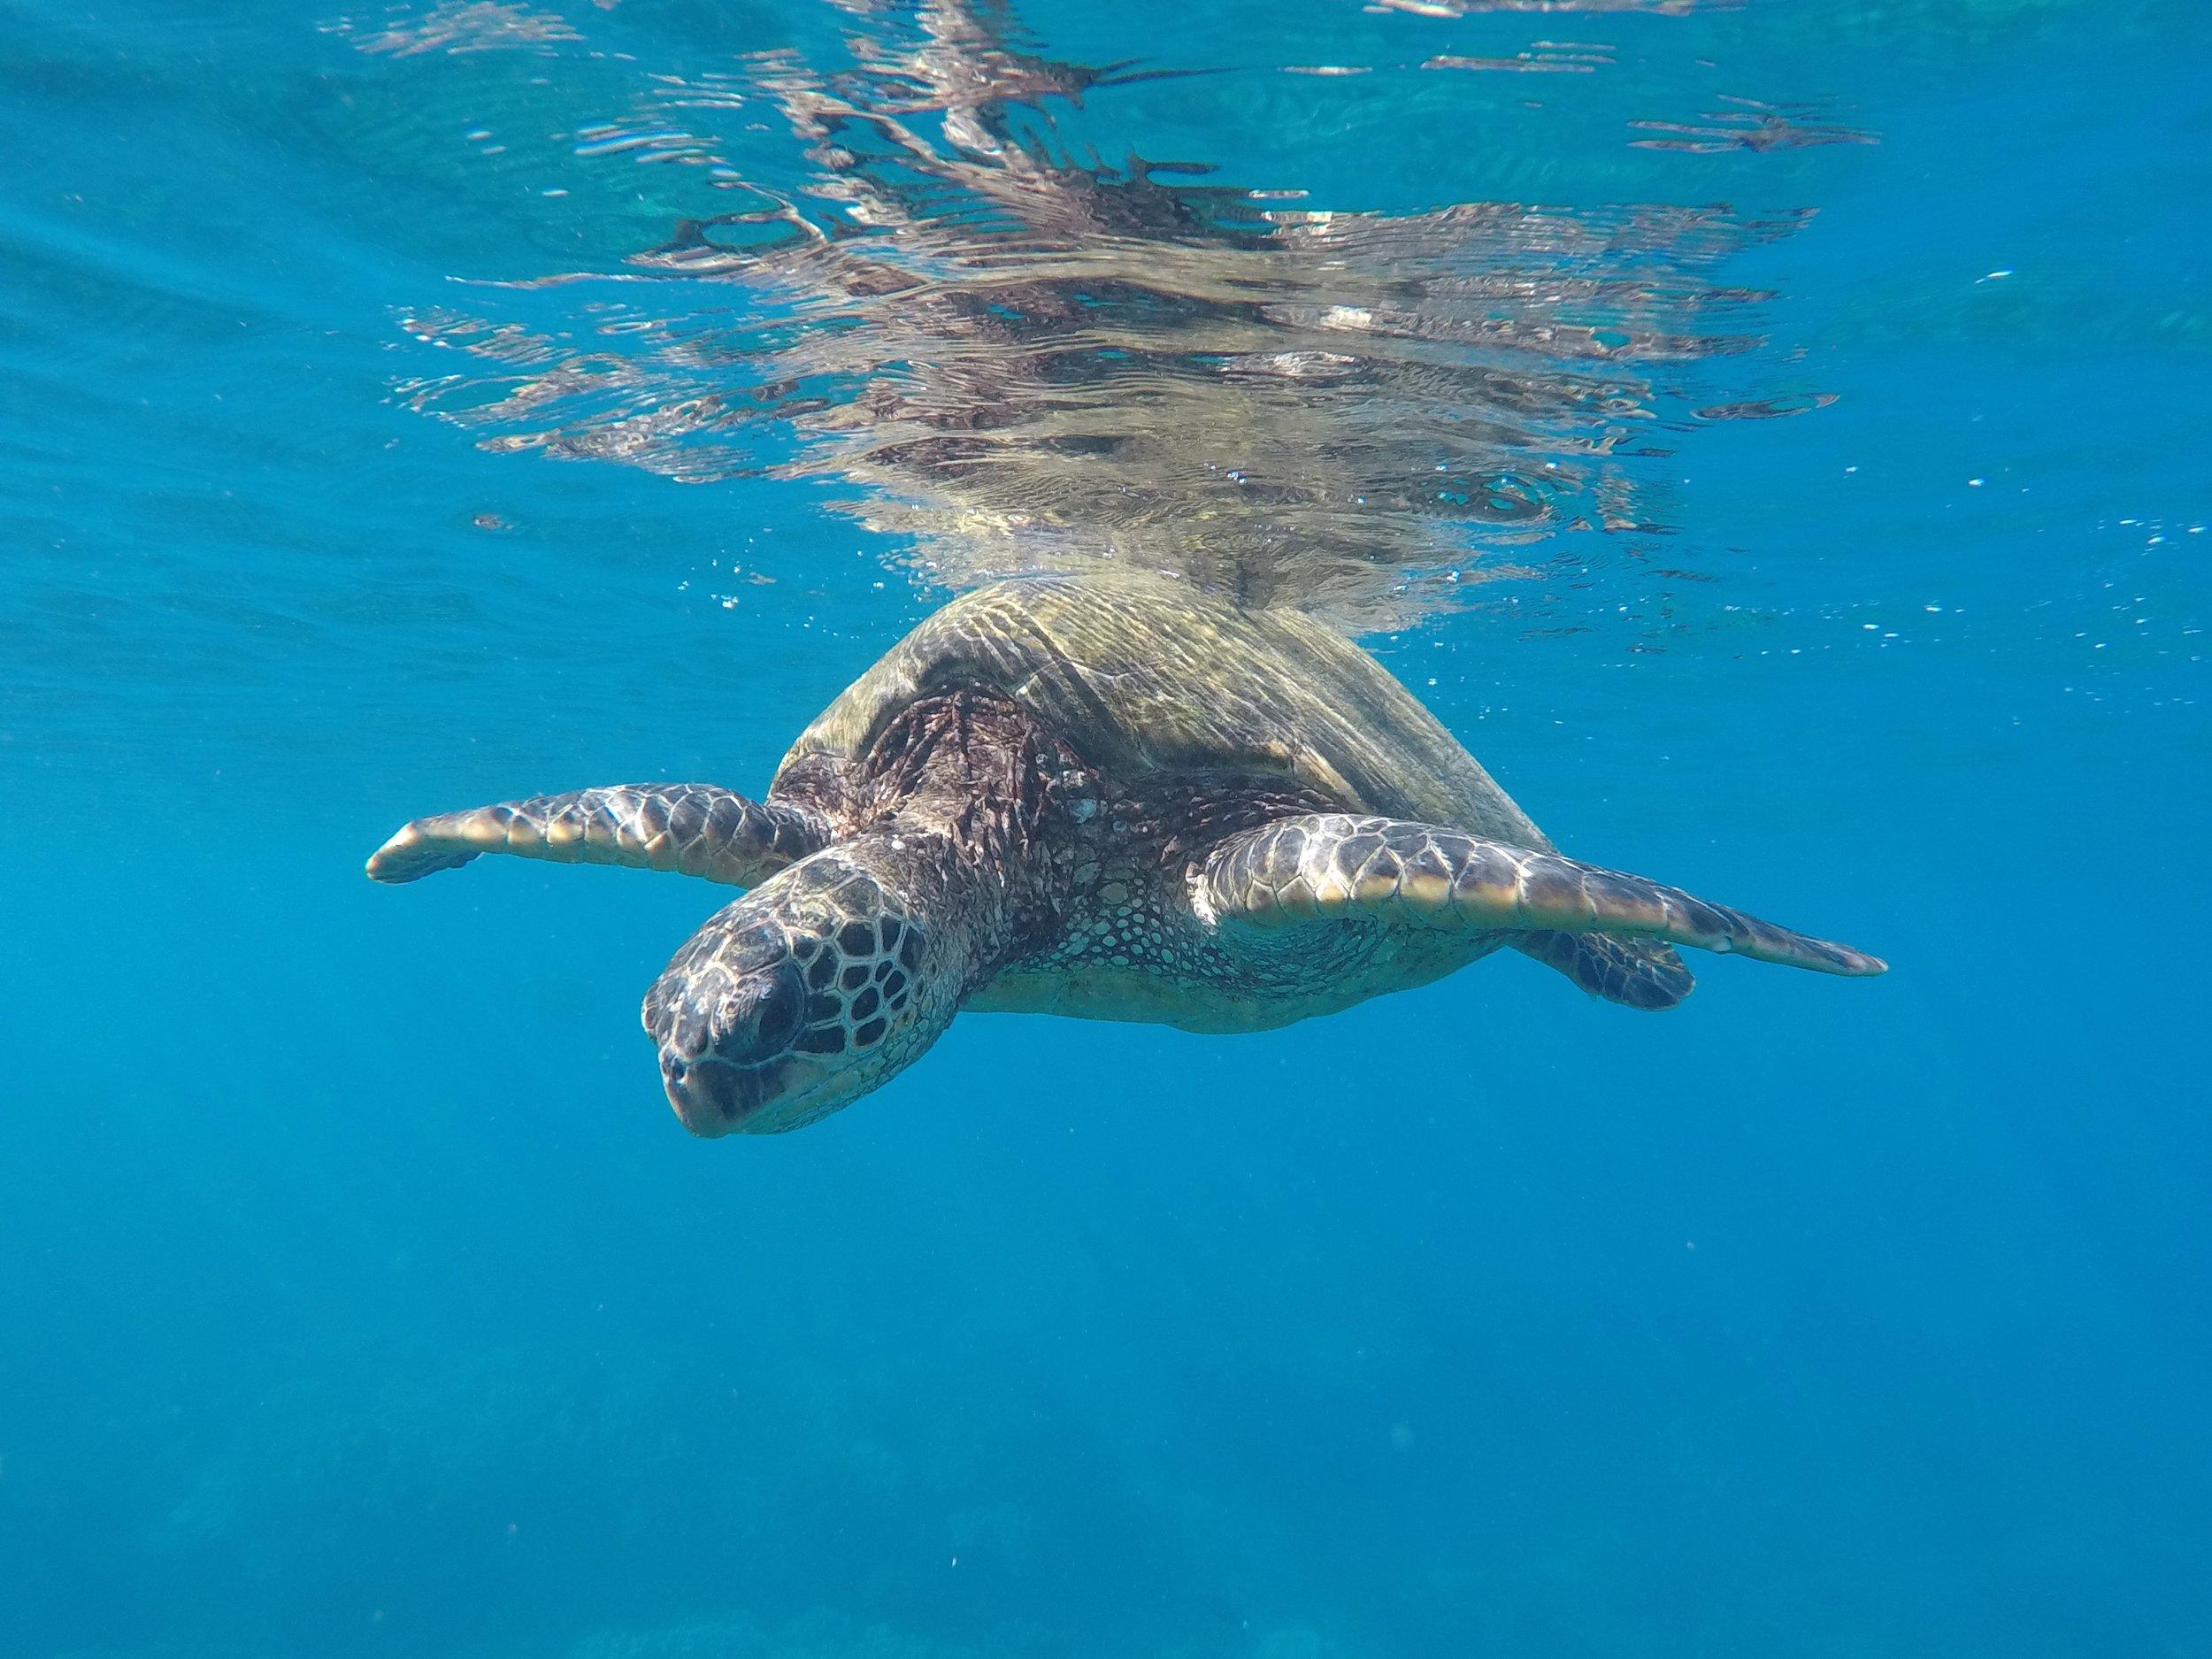 Blue Soul Maui, Maui, Private Tours, Maui Private Tours, Outrigger Canoe, Outrigger Canoe Tour, Paddle Adventure, Canoe Surfing, Green Sea Turtle, Sea Turtle, Outdoor Adventure